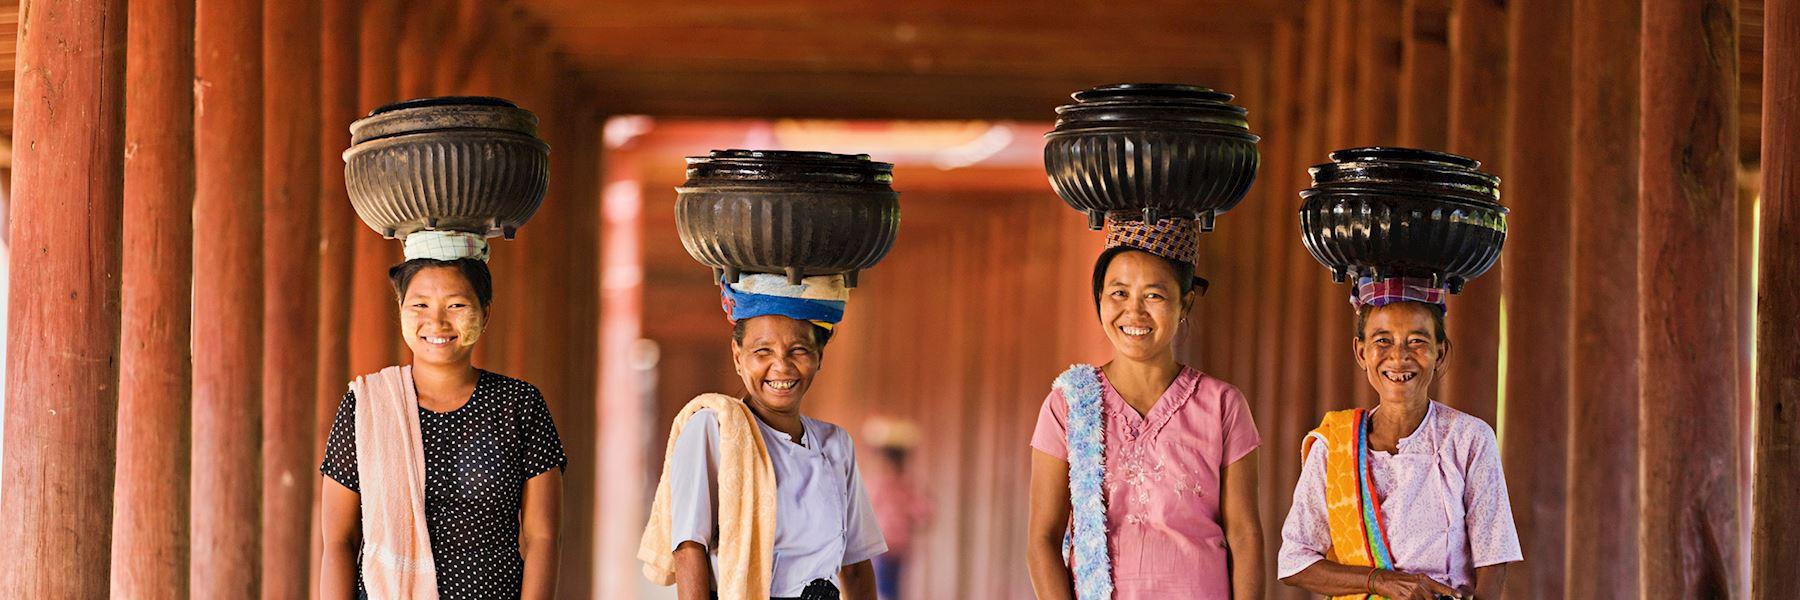 Burma (Myanmar) travel guides